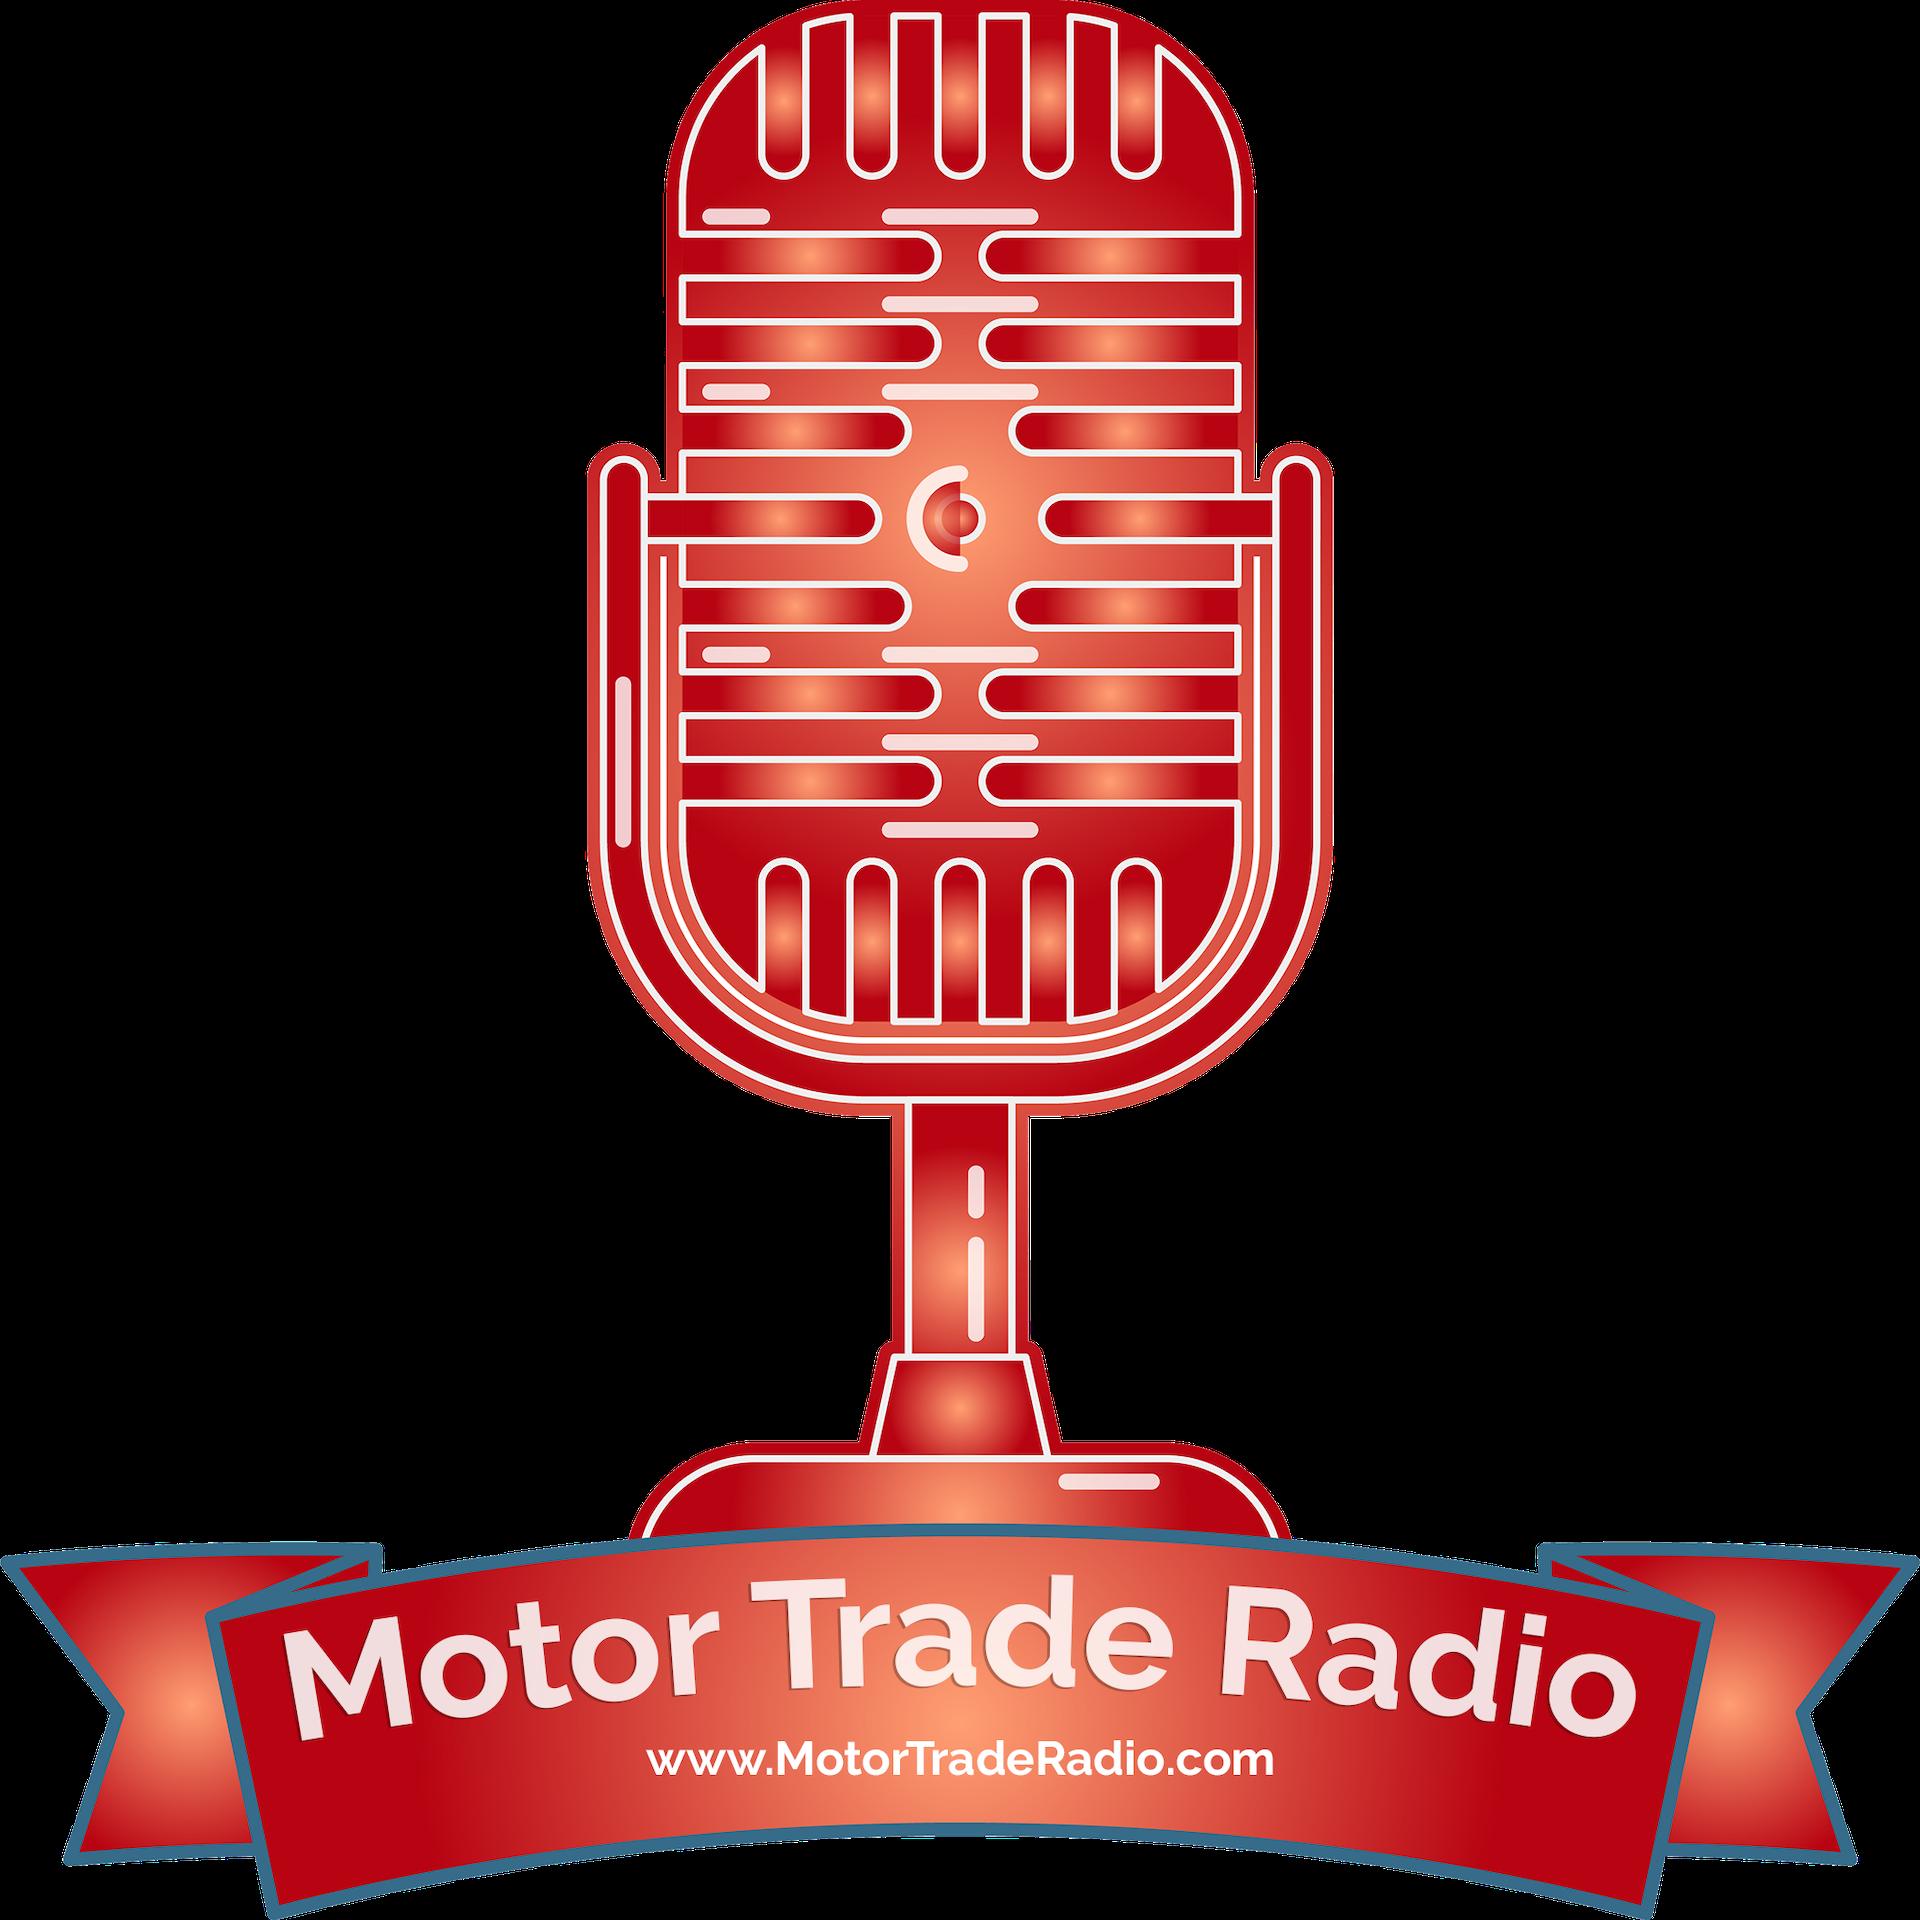 Motor Trade Radio show art